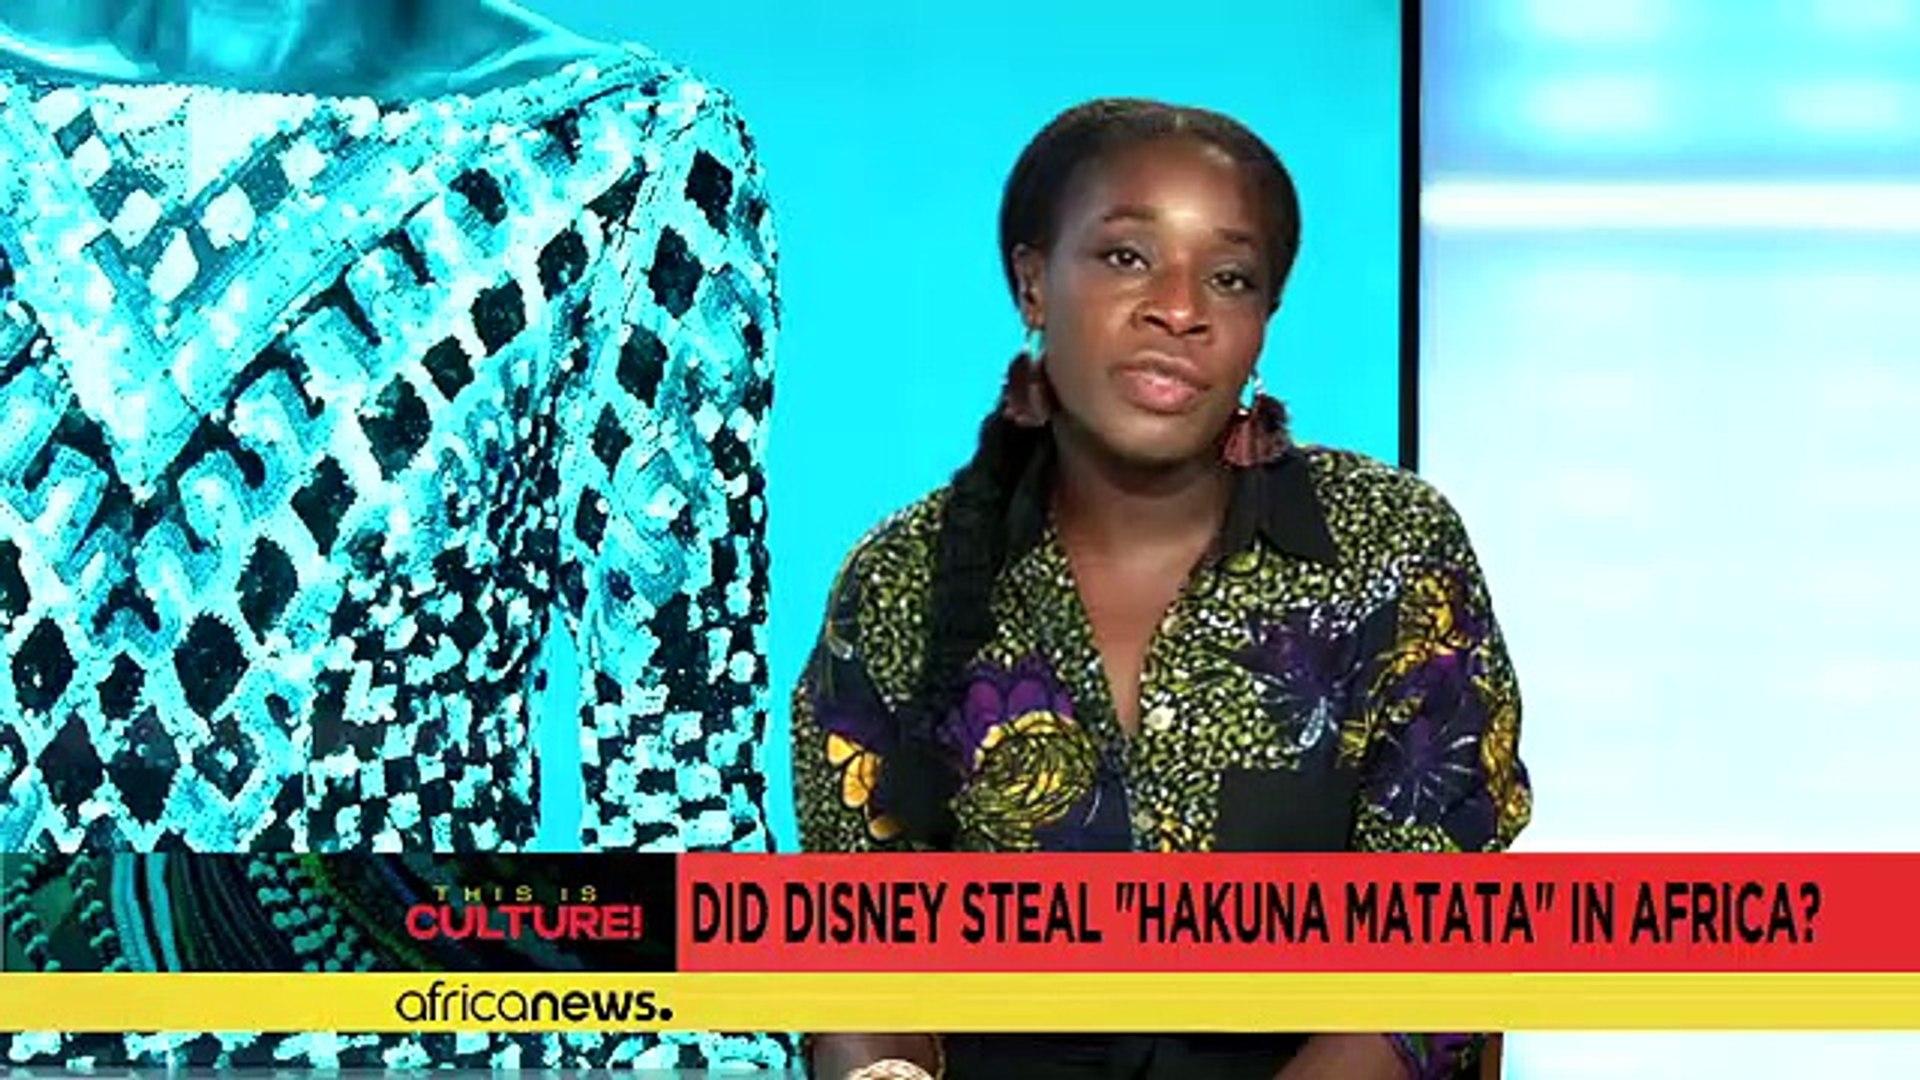 Did Disney steal